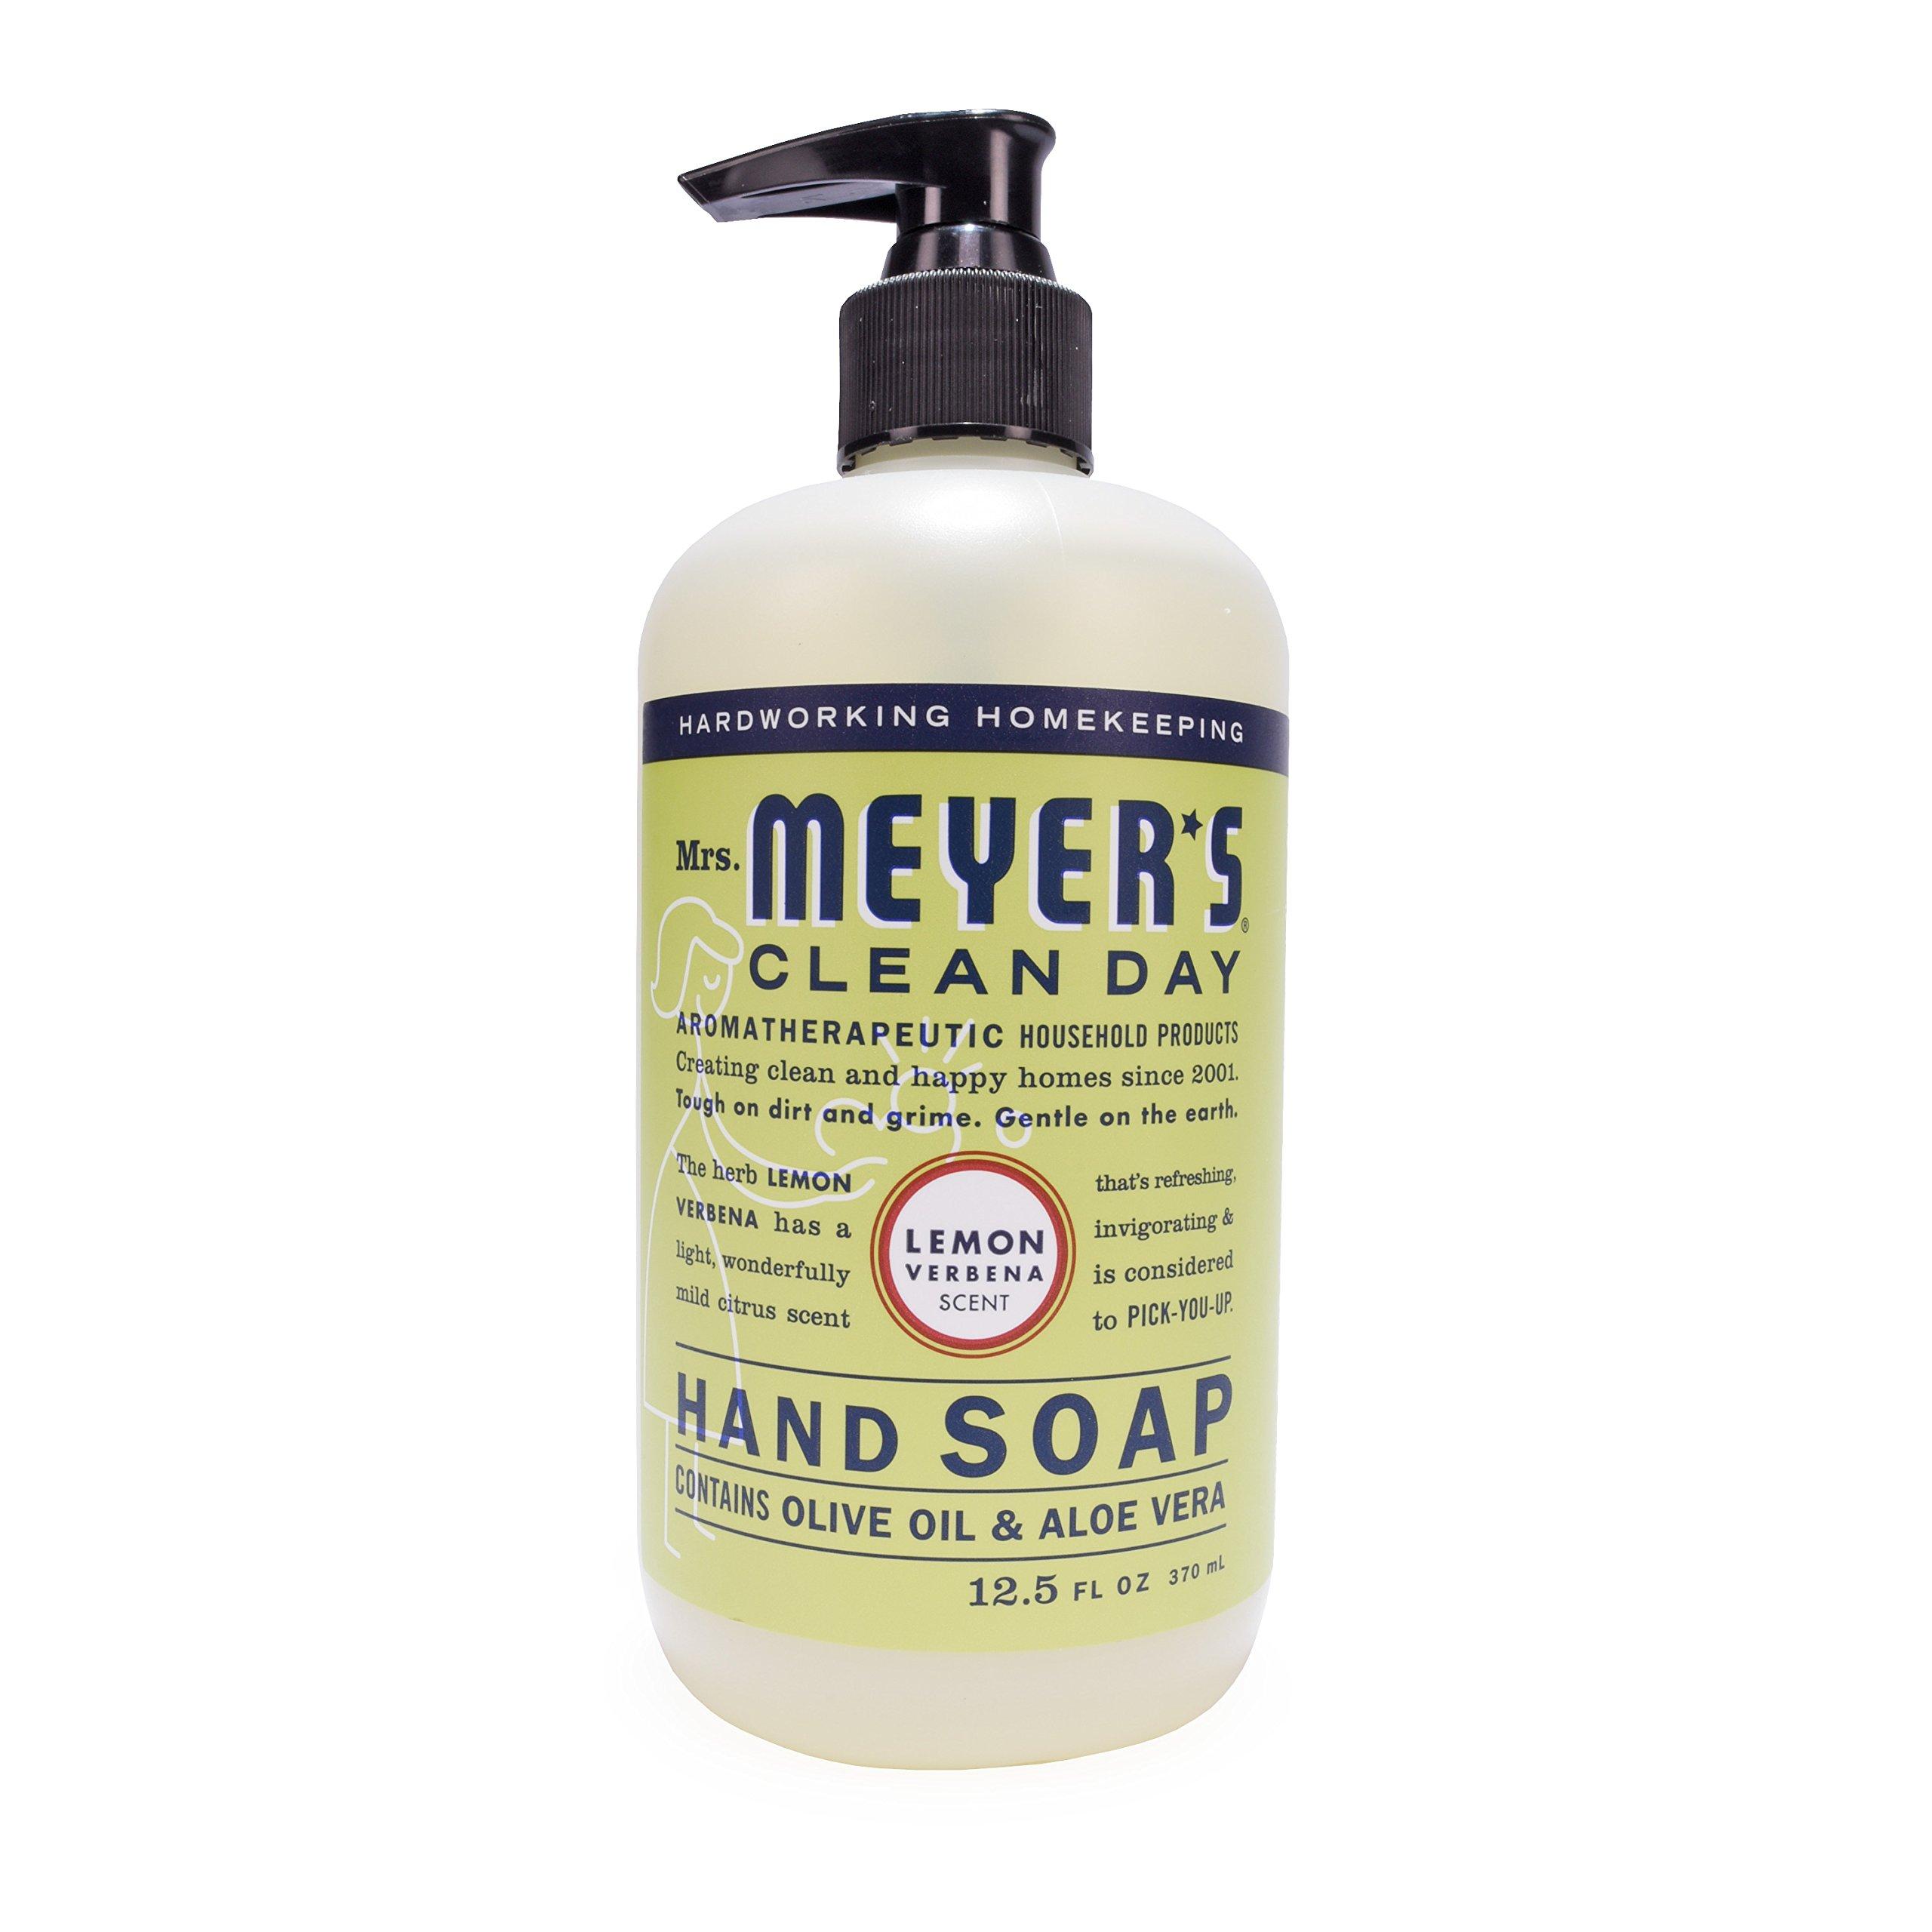 Mrs. Meyer's Clean Day Kitchen Basics Set, Lemon Verbena, 3 ct: Dish Soap (16 fl oz), Hand Soap (12.5 fl oz), Multi-Surface Everyday Cleaner (16 fl oz) by Mrs. Meyer's Clean Day (Image #6)